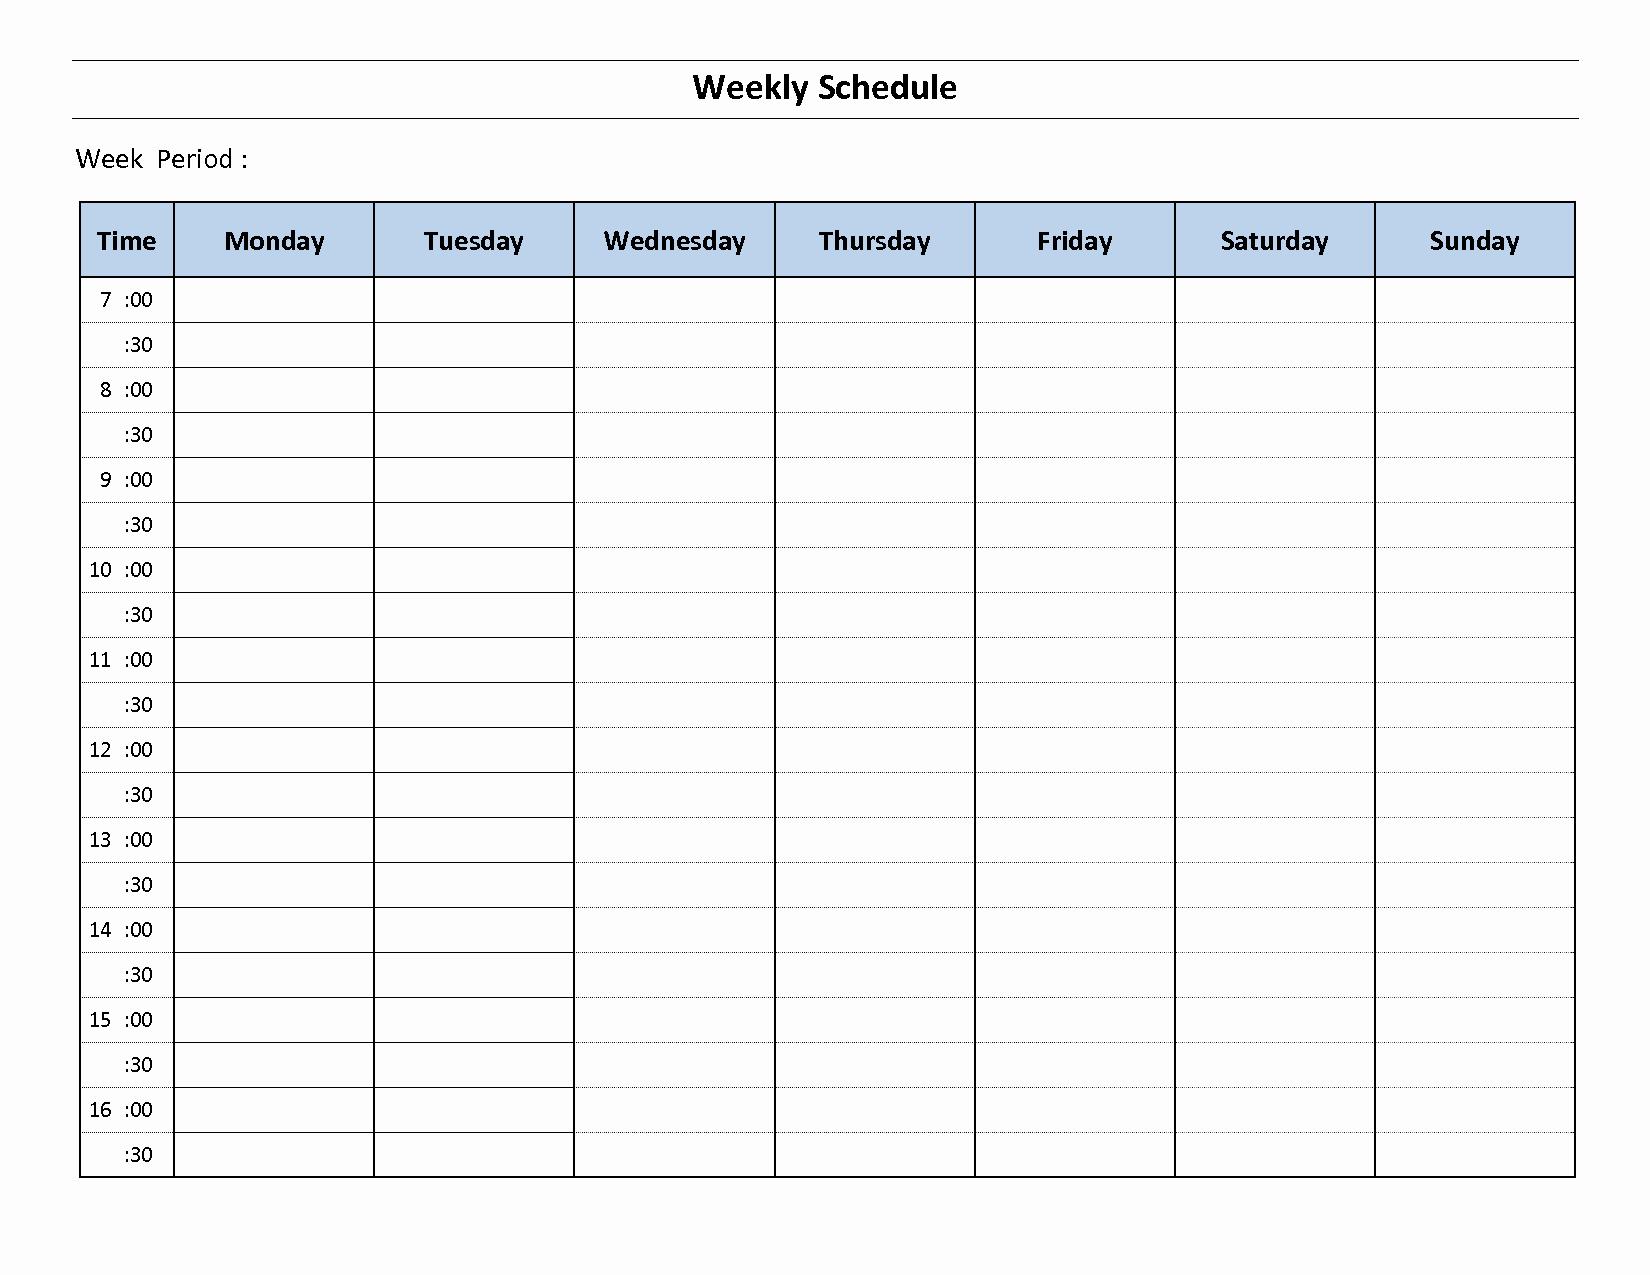 Weekly Schedule Templates Excel Fresh Construction Schedule Template Excel Free Download